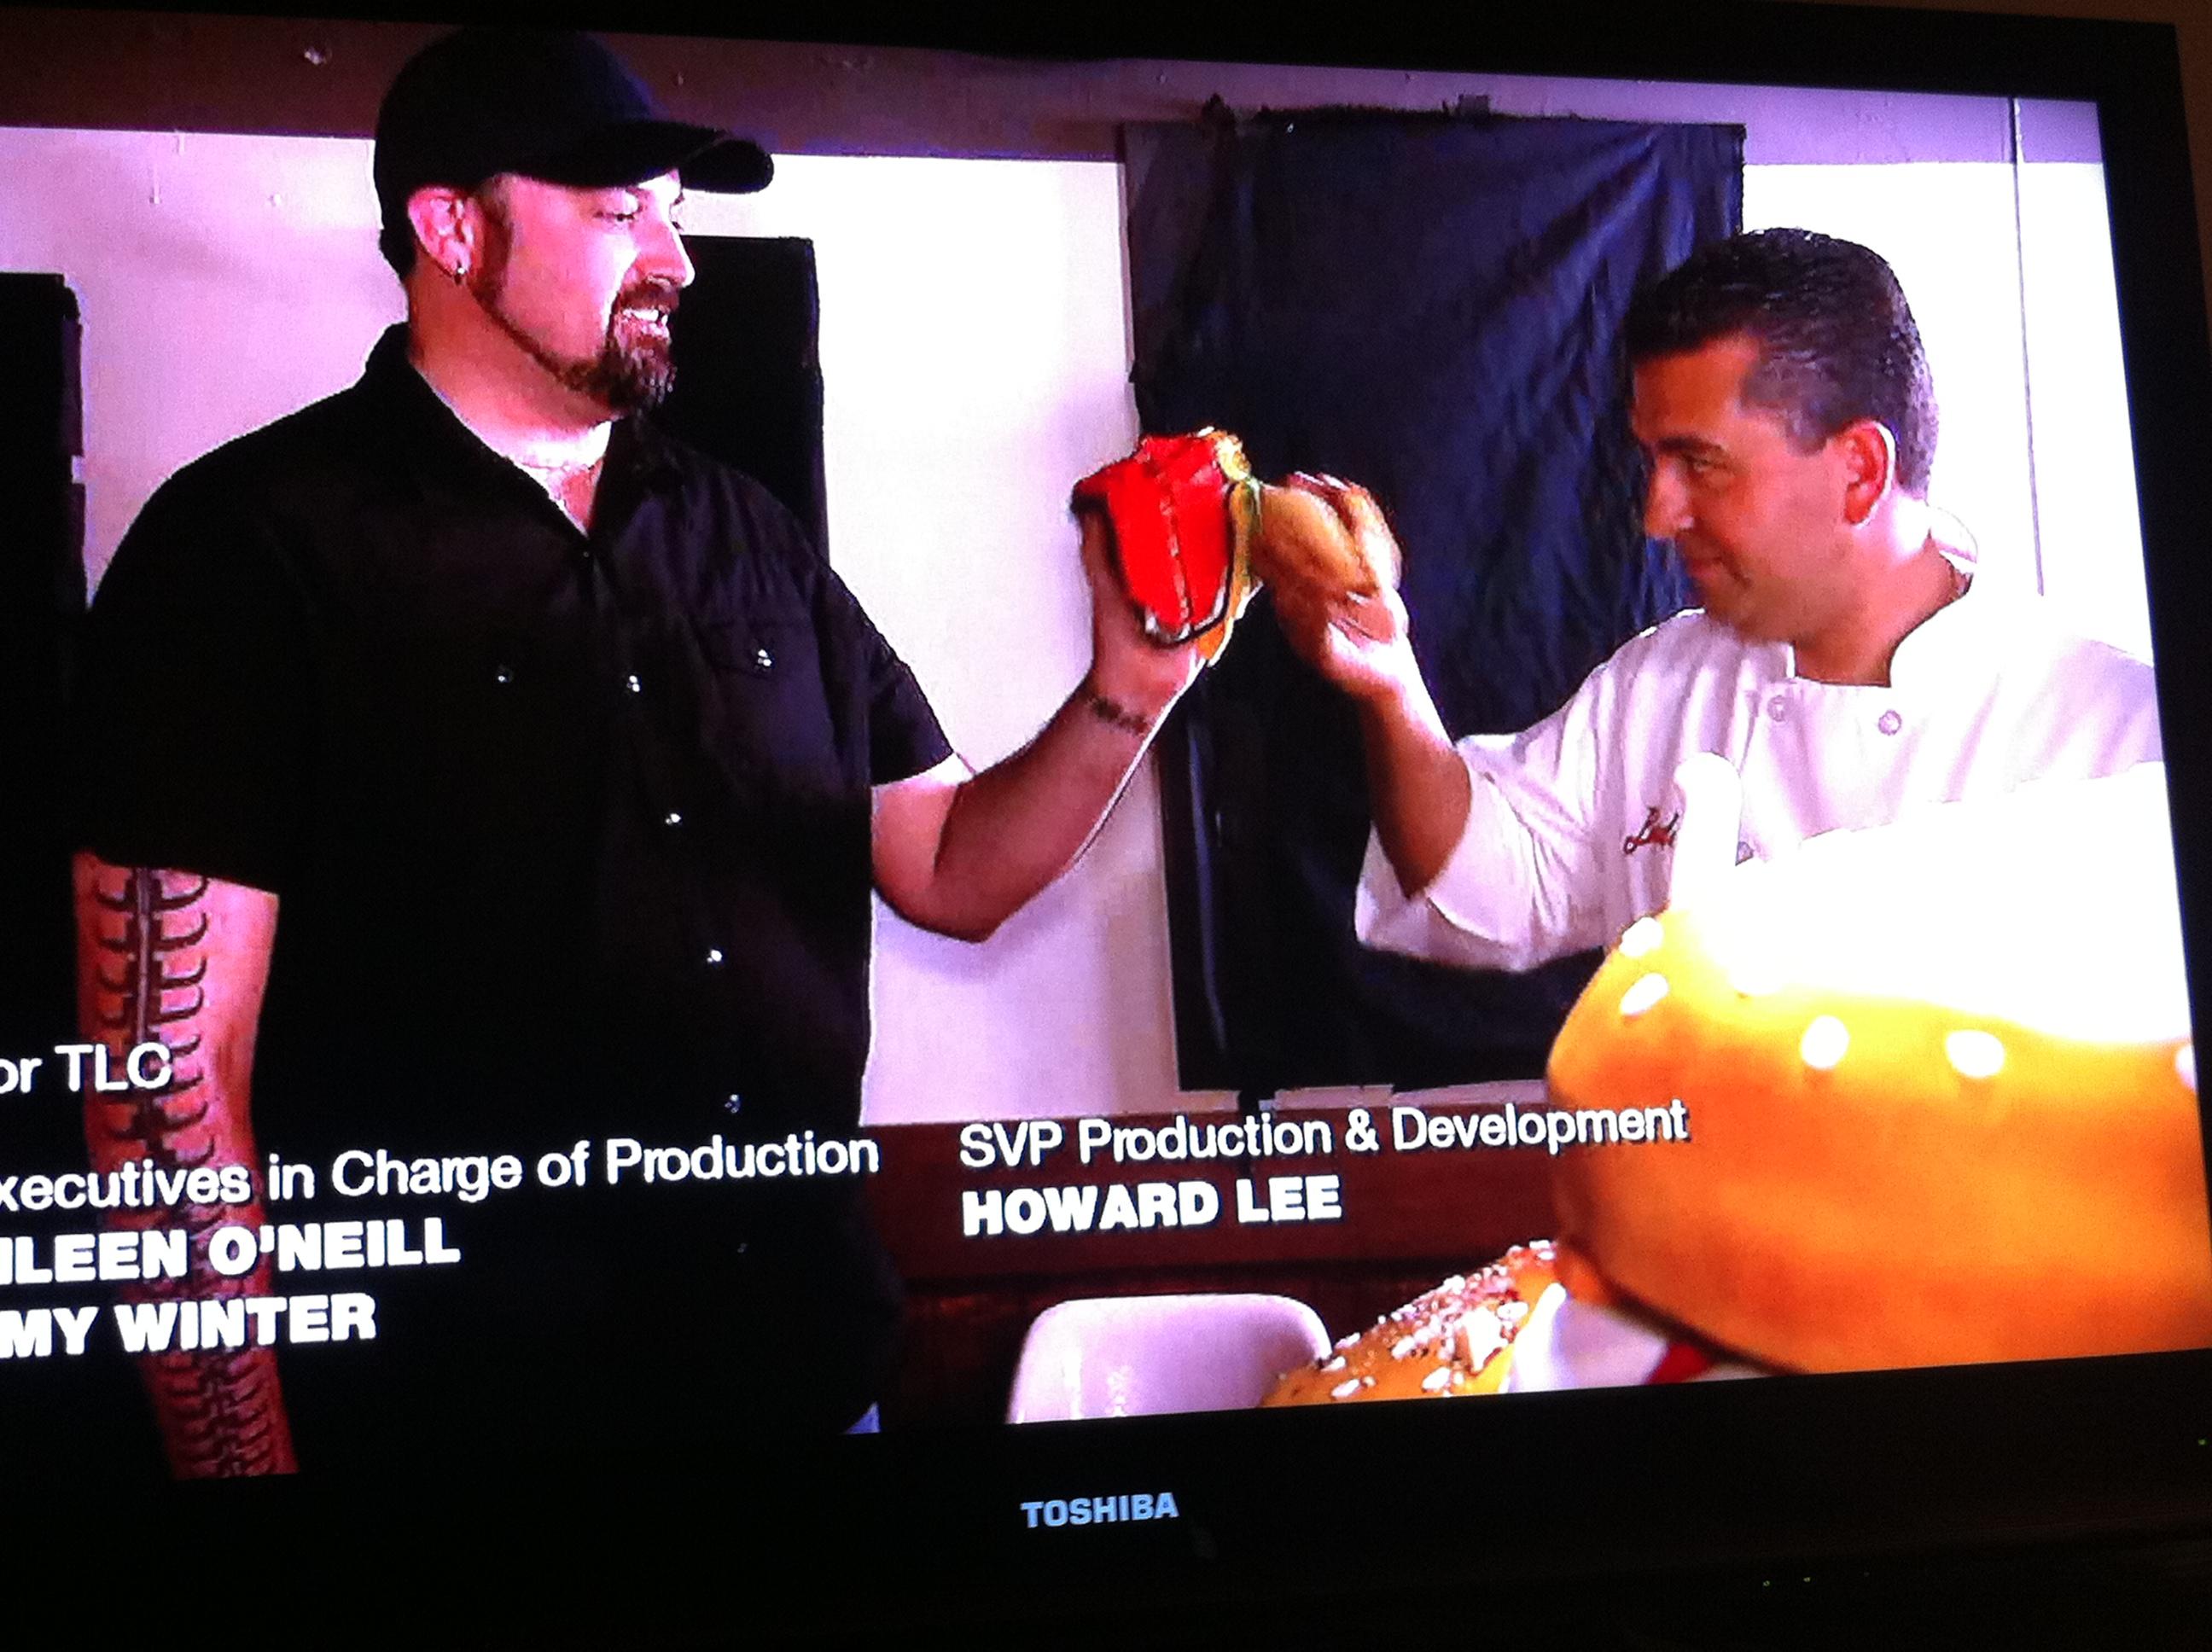 david-rev-ciancio-expert-burger-taster-burger-business-burger-famous-tv_1461